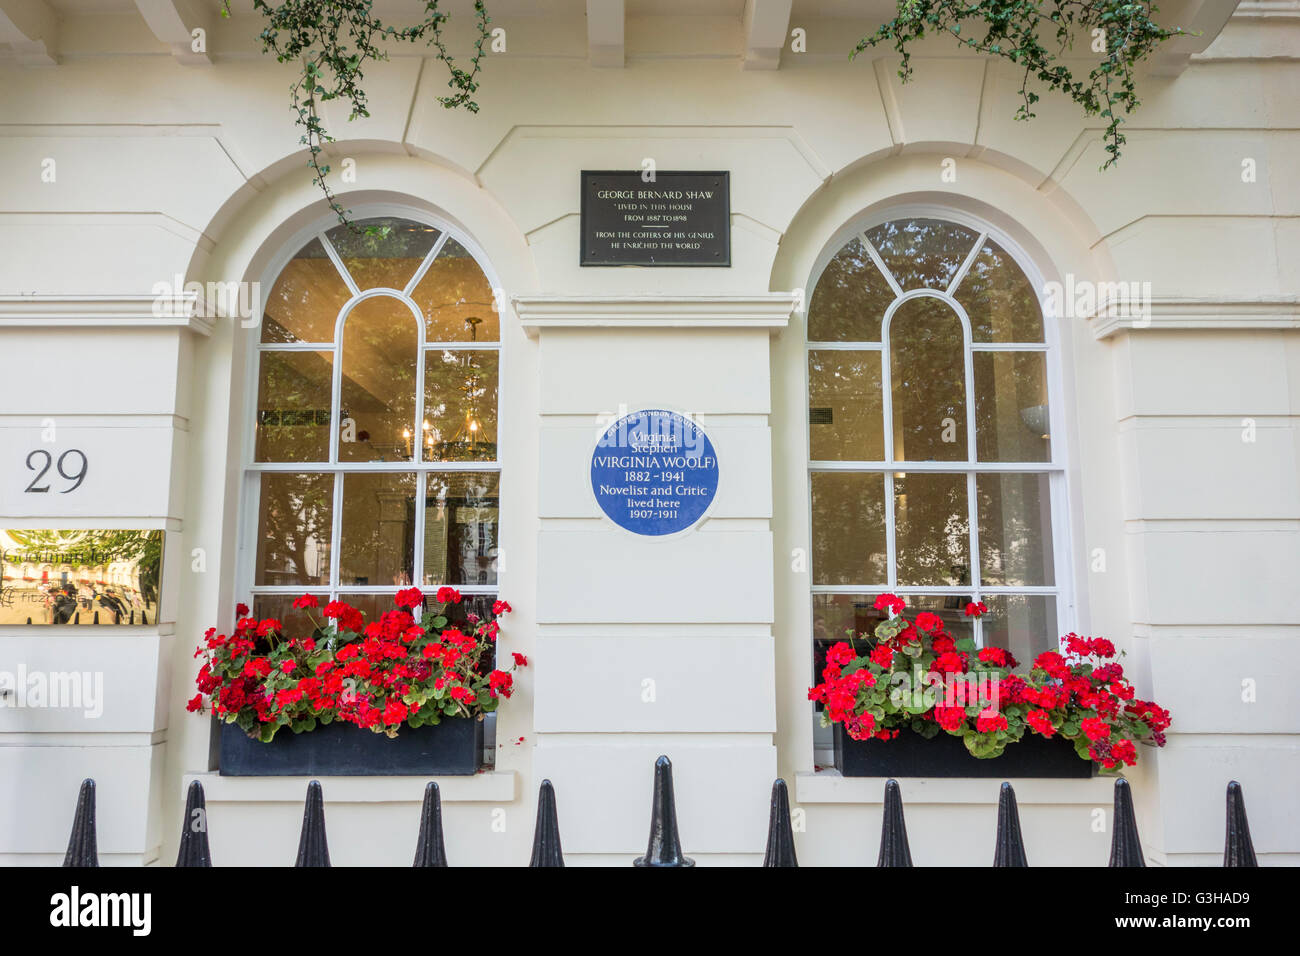 Blue Plaque, Virginia Stephen (Virginia Woolf) & Plaque for George Bernard Shaw, London, UK - Stock Image